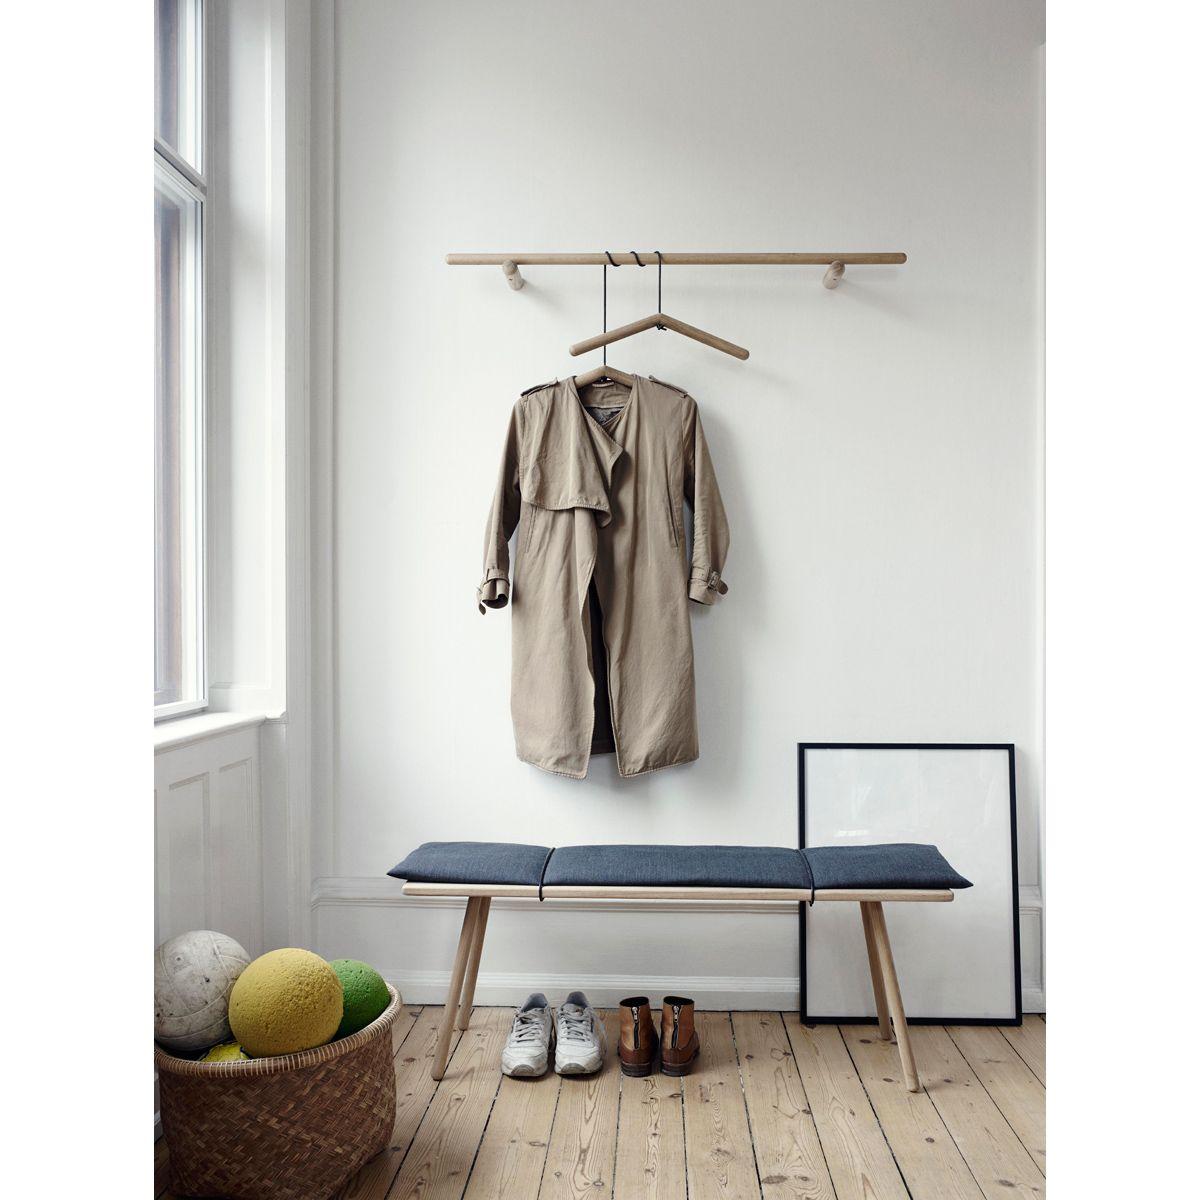 2019 Mudroom Bench Inspiration: Skagerak - Georg Bench En 2019